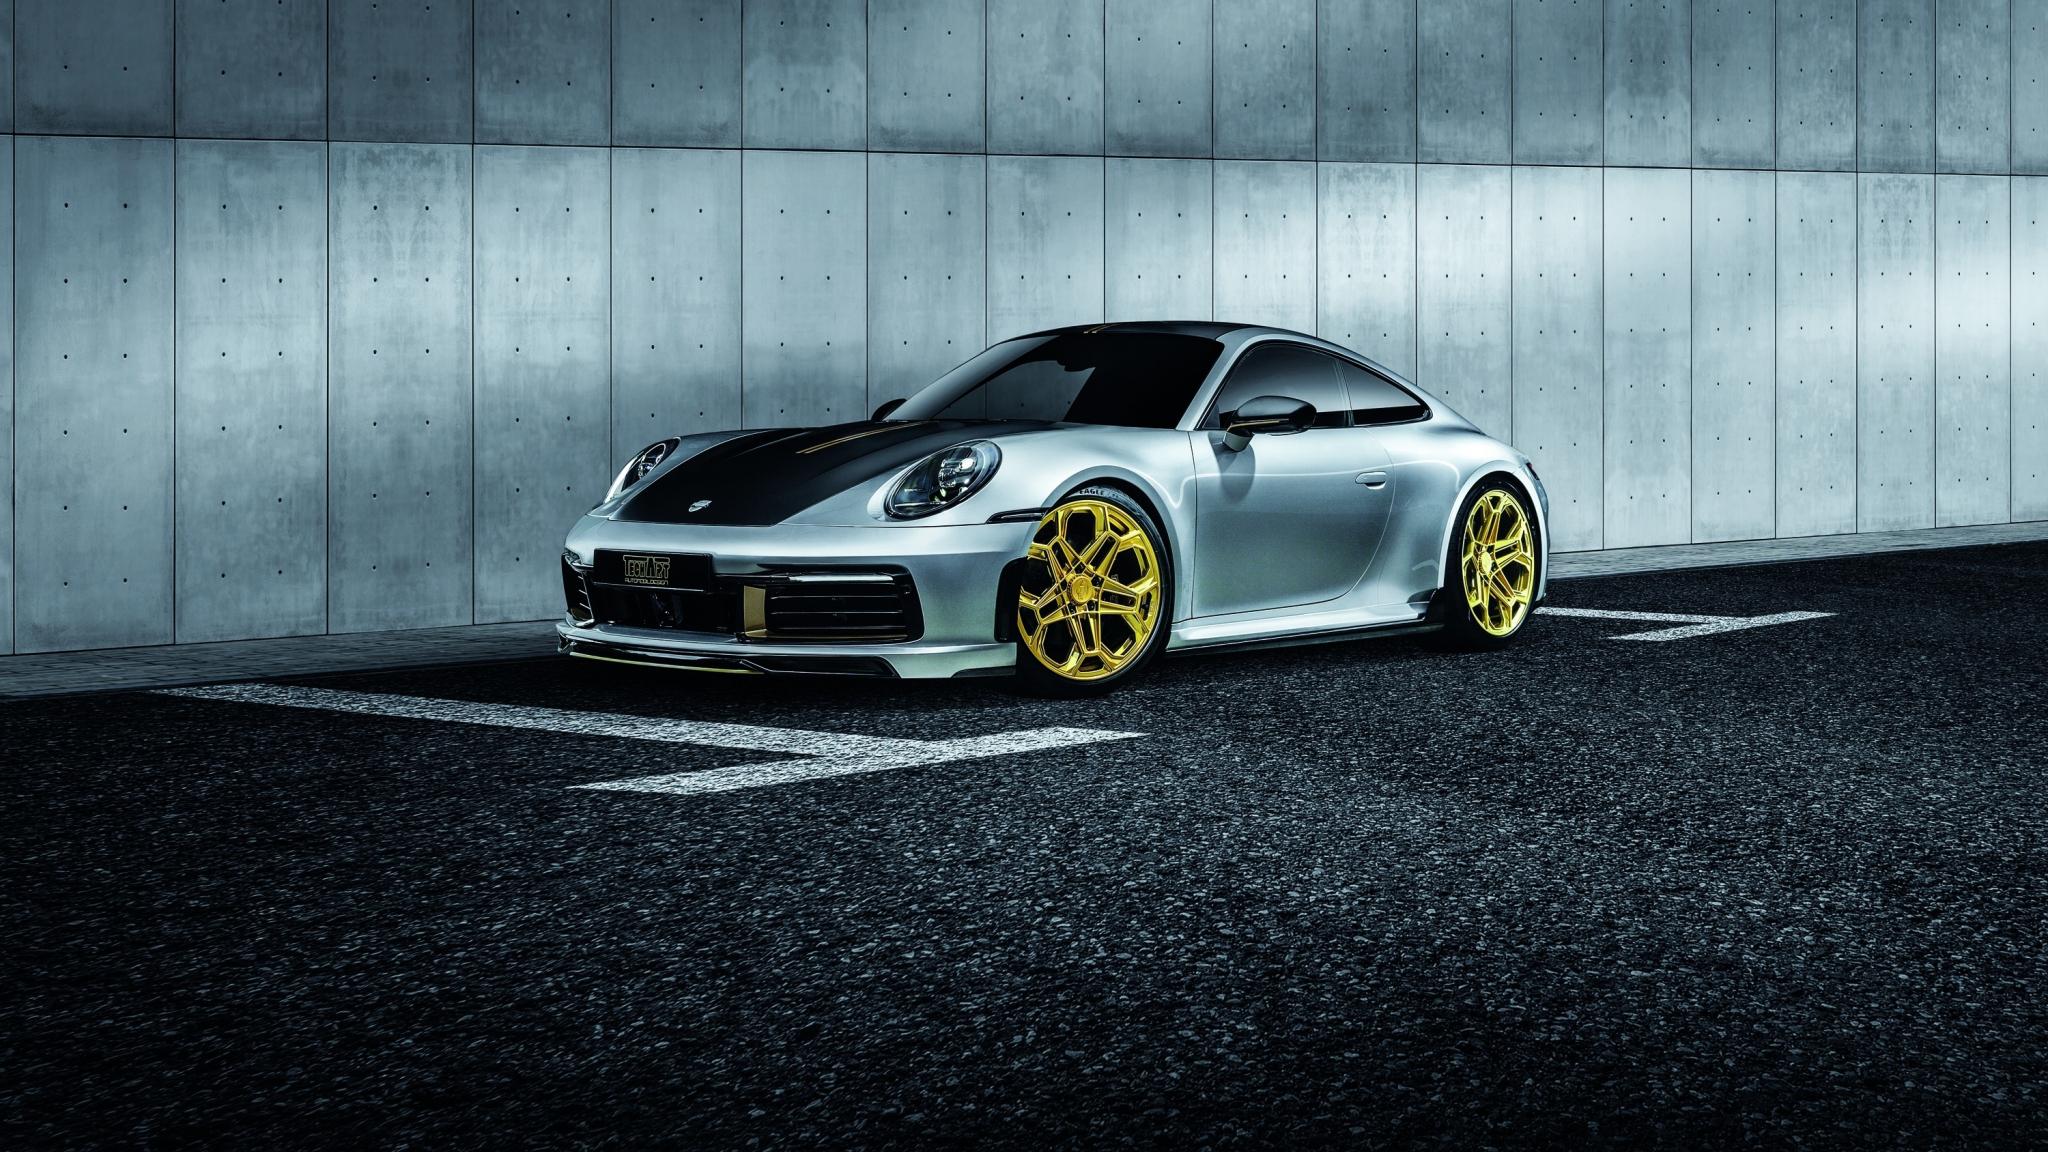 Download 2048x1152 Wallpaper Golden Wheels Porsche 911 Carrera Techart Dual Wide Widescreen 2048x1152 Hd Image Background 22879